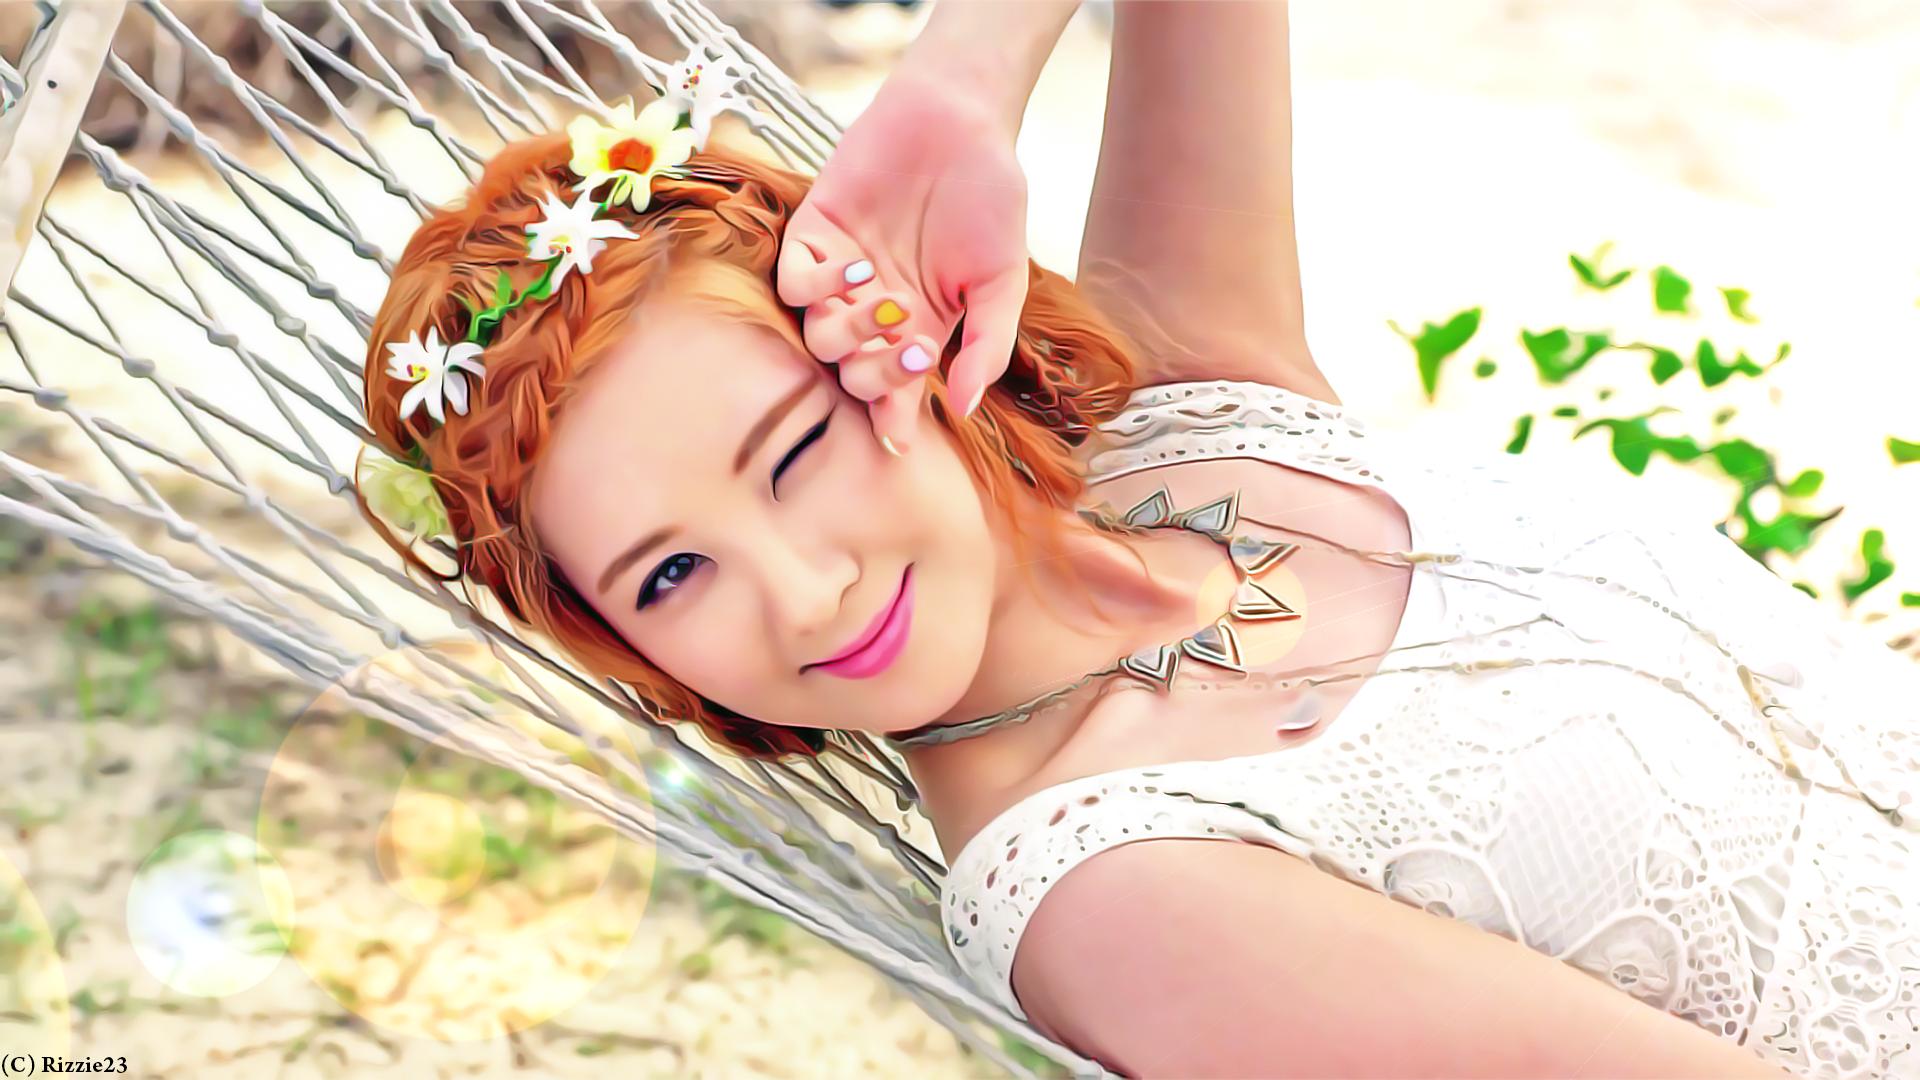 Snsd Party Wallpaper Hq Celebrity Photos Onehallyu Snsd Seohyun Girls Generation